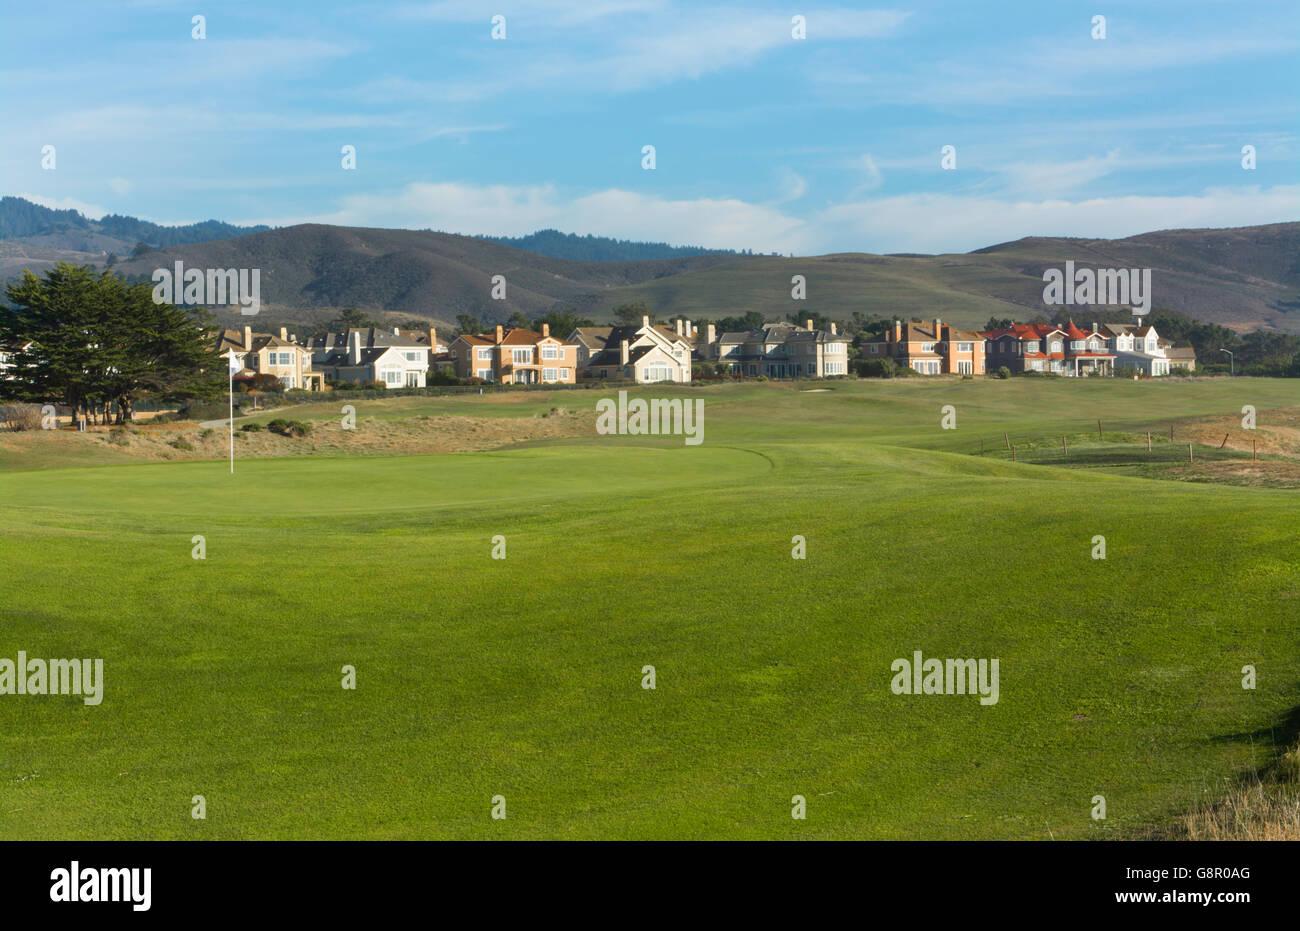 Half Moon Bay California Ritz Hotel  Golf Course, Half Moon Bay Golf Links 18th Hole with flag - Stock Image